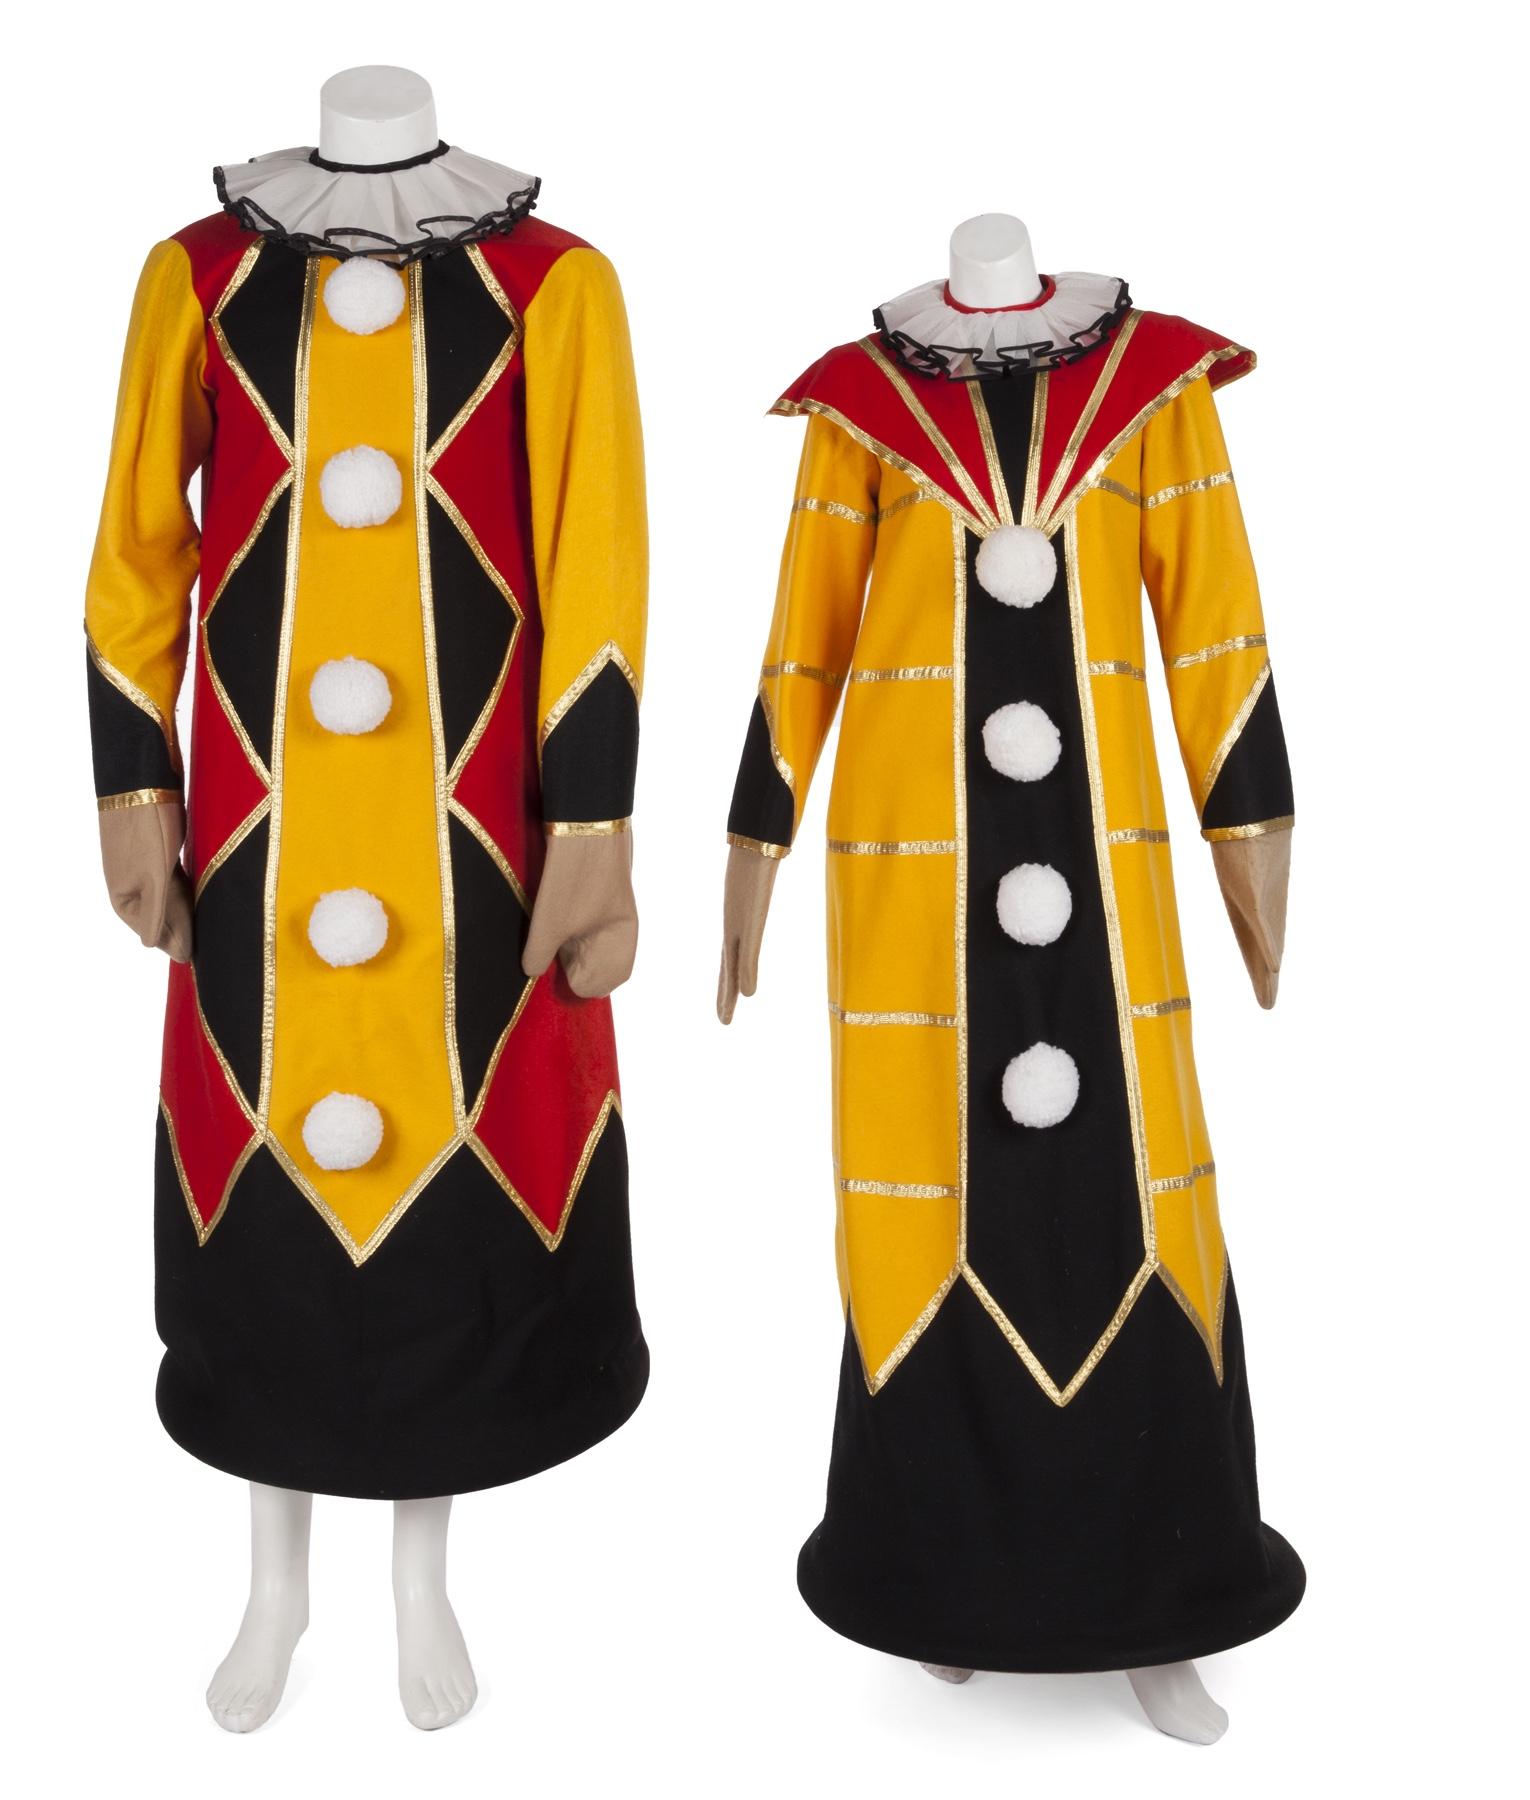 Carol Burnett and Joel Gray costume by Bob Mackie from Carol Burnett Show